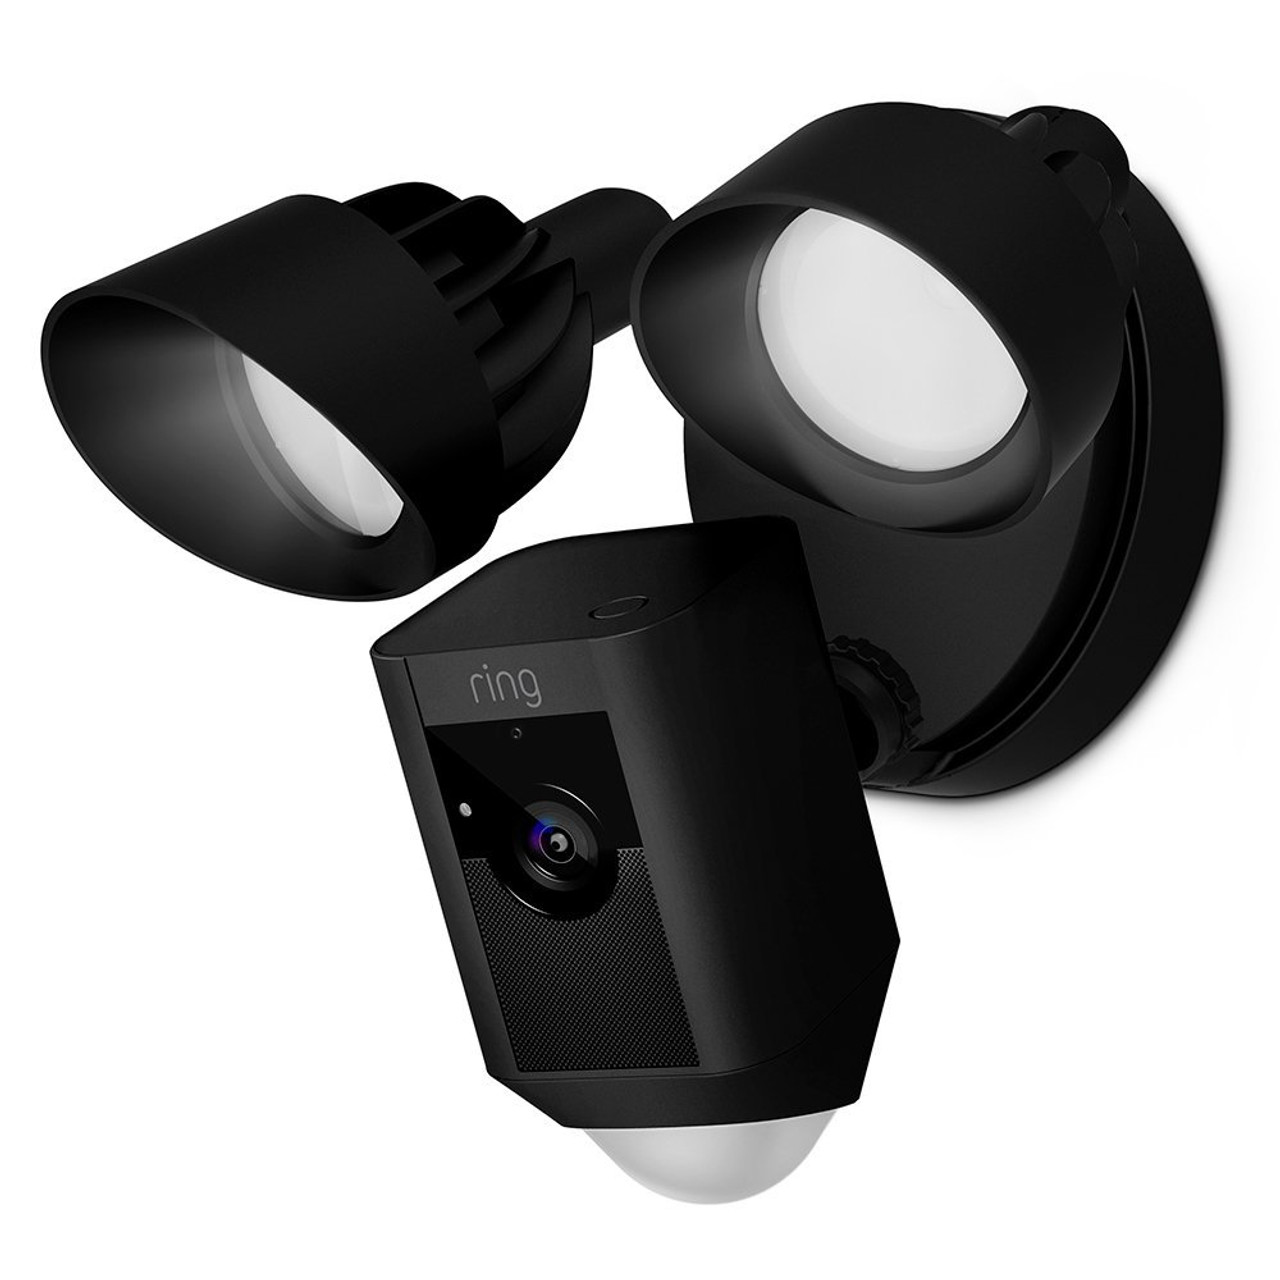 Ring Floodlight Cam, Black